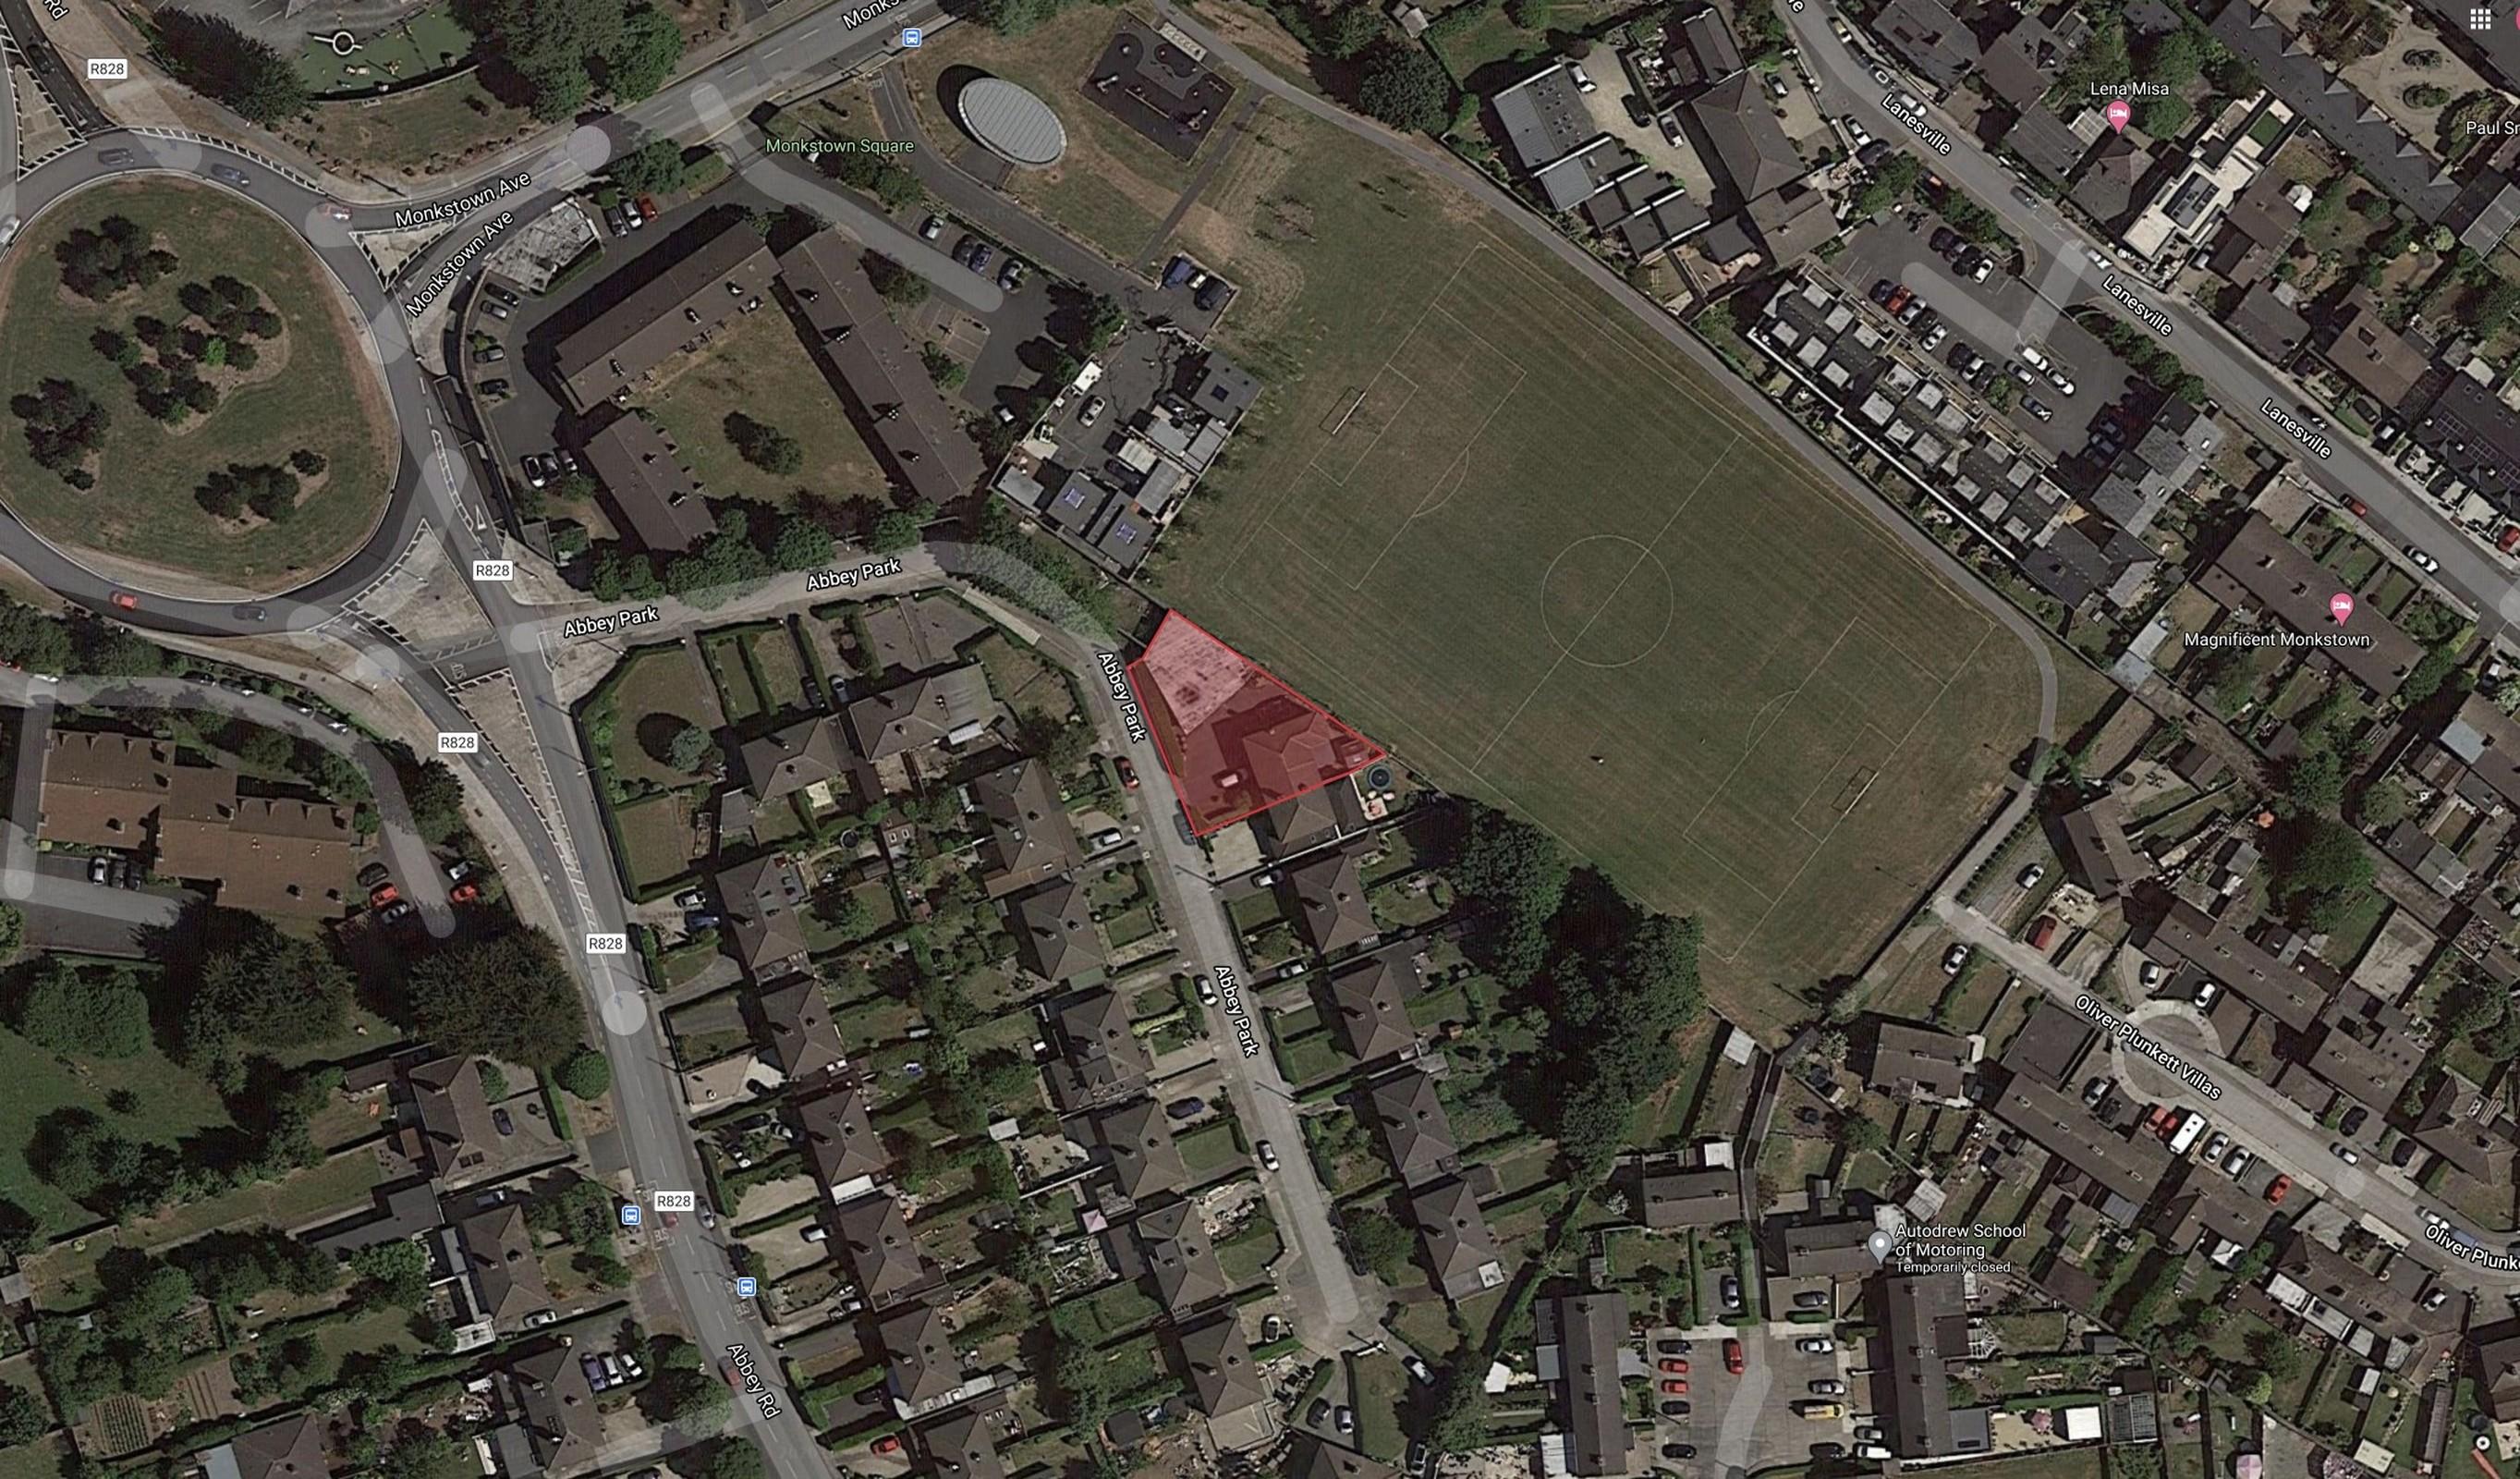 28 Abbey Park, Monkstown, Co. Dublin